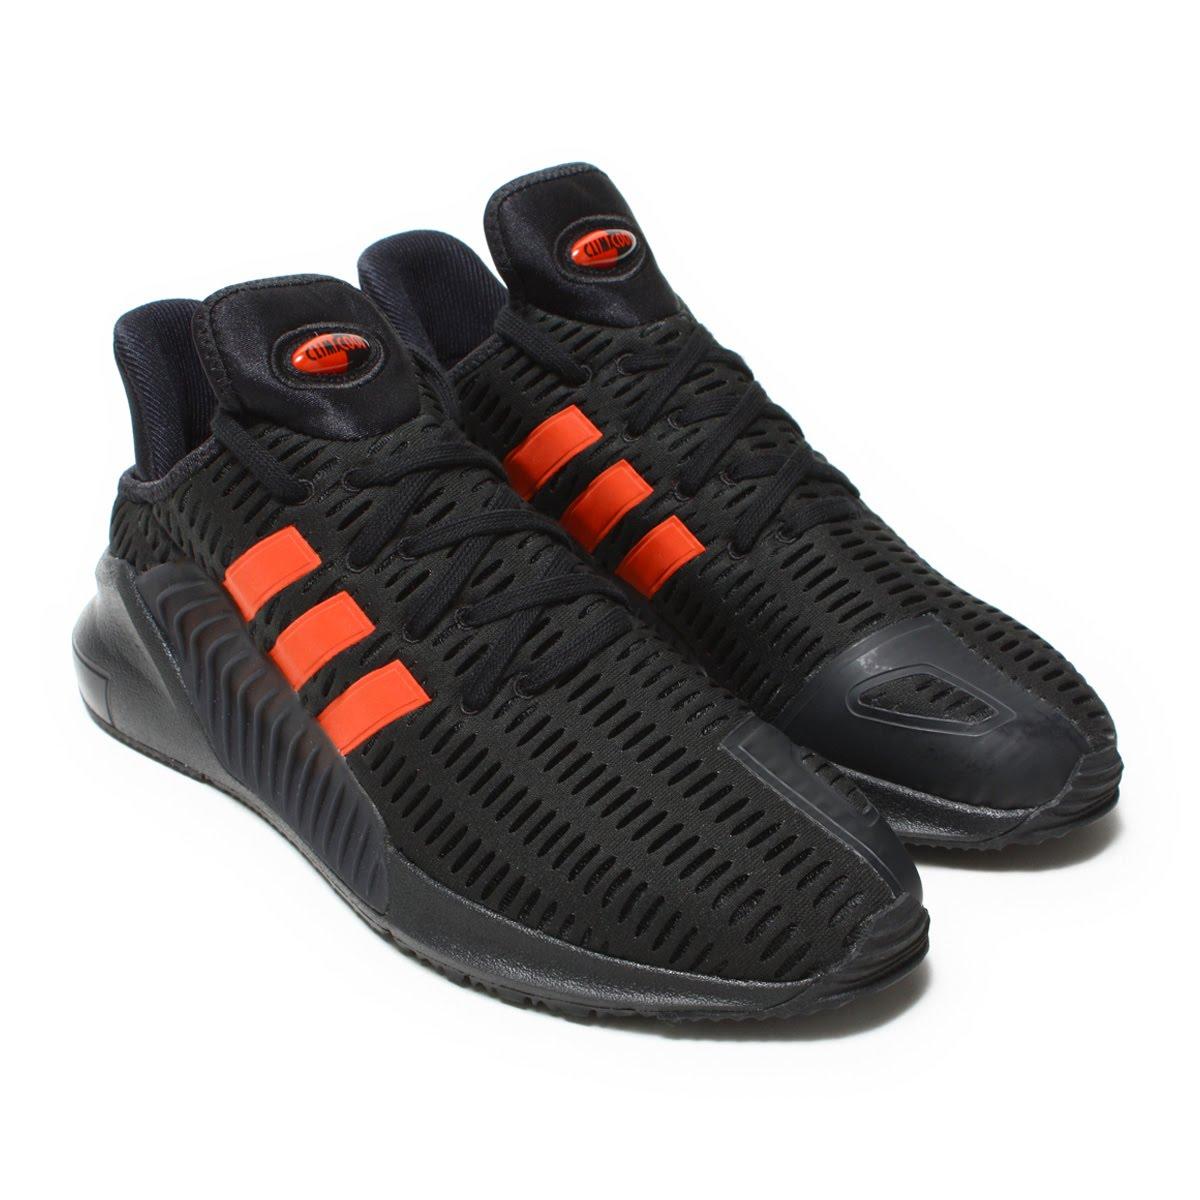 adidas Originals CLIMACOOL 02/17(アディダス オリジナルス クライマクール 02/17)CORE BLACK / HI-RES RED/CORE BLACK【メンズ スニーカー】18SS-S